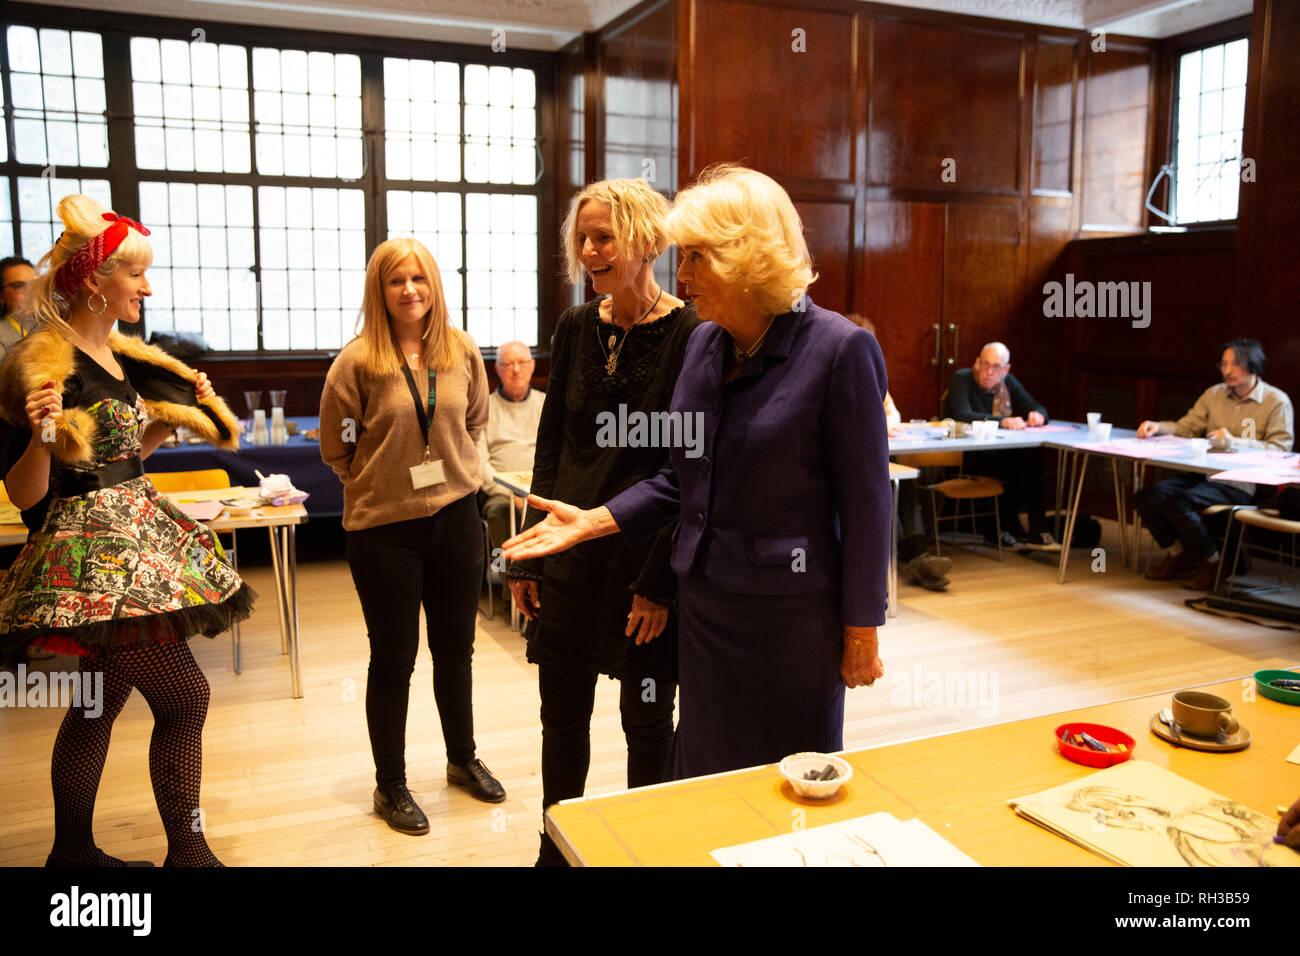 The Duchess Of Cornwall Visiting The Refurbished Wolfson British Academy Room Where An Art Class Run